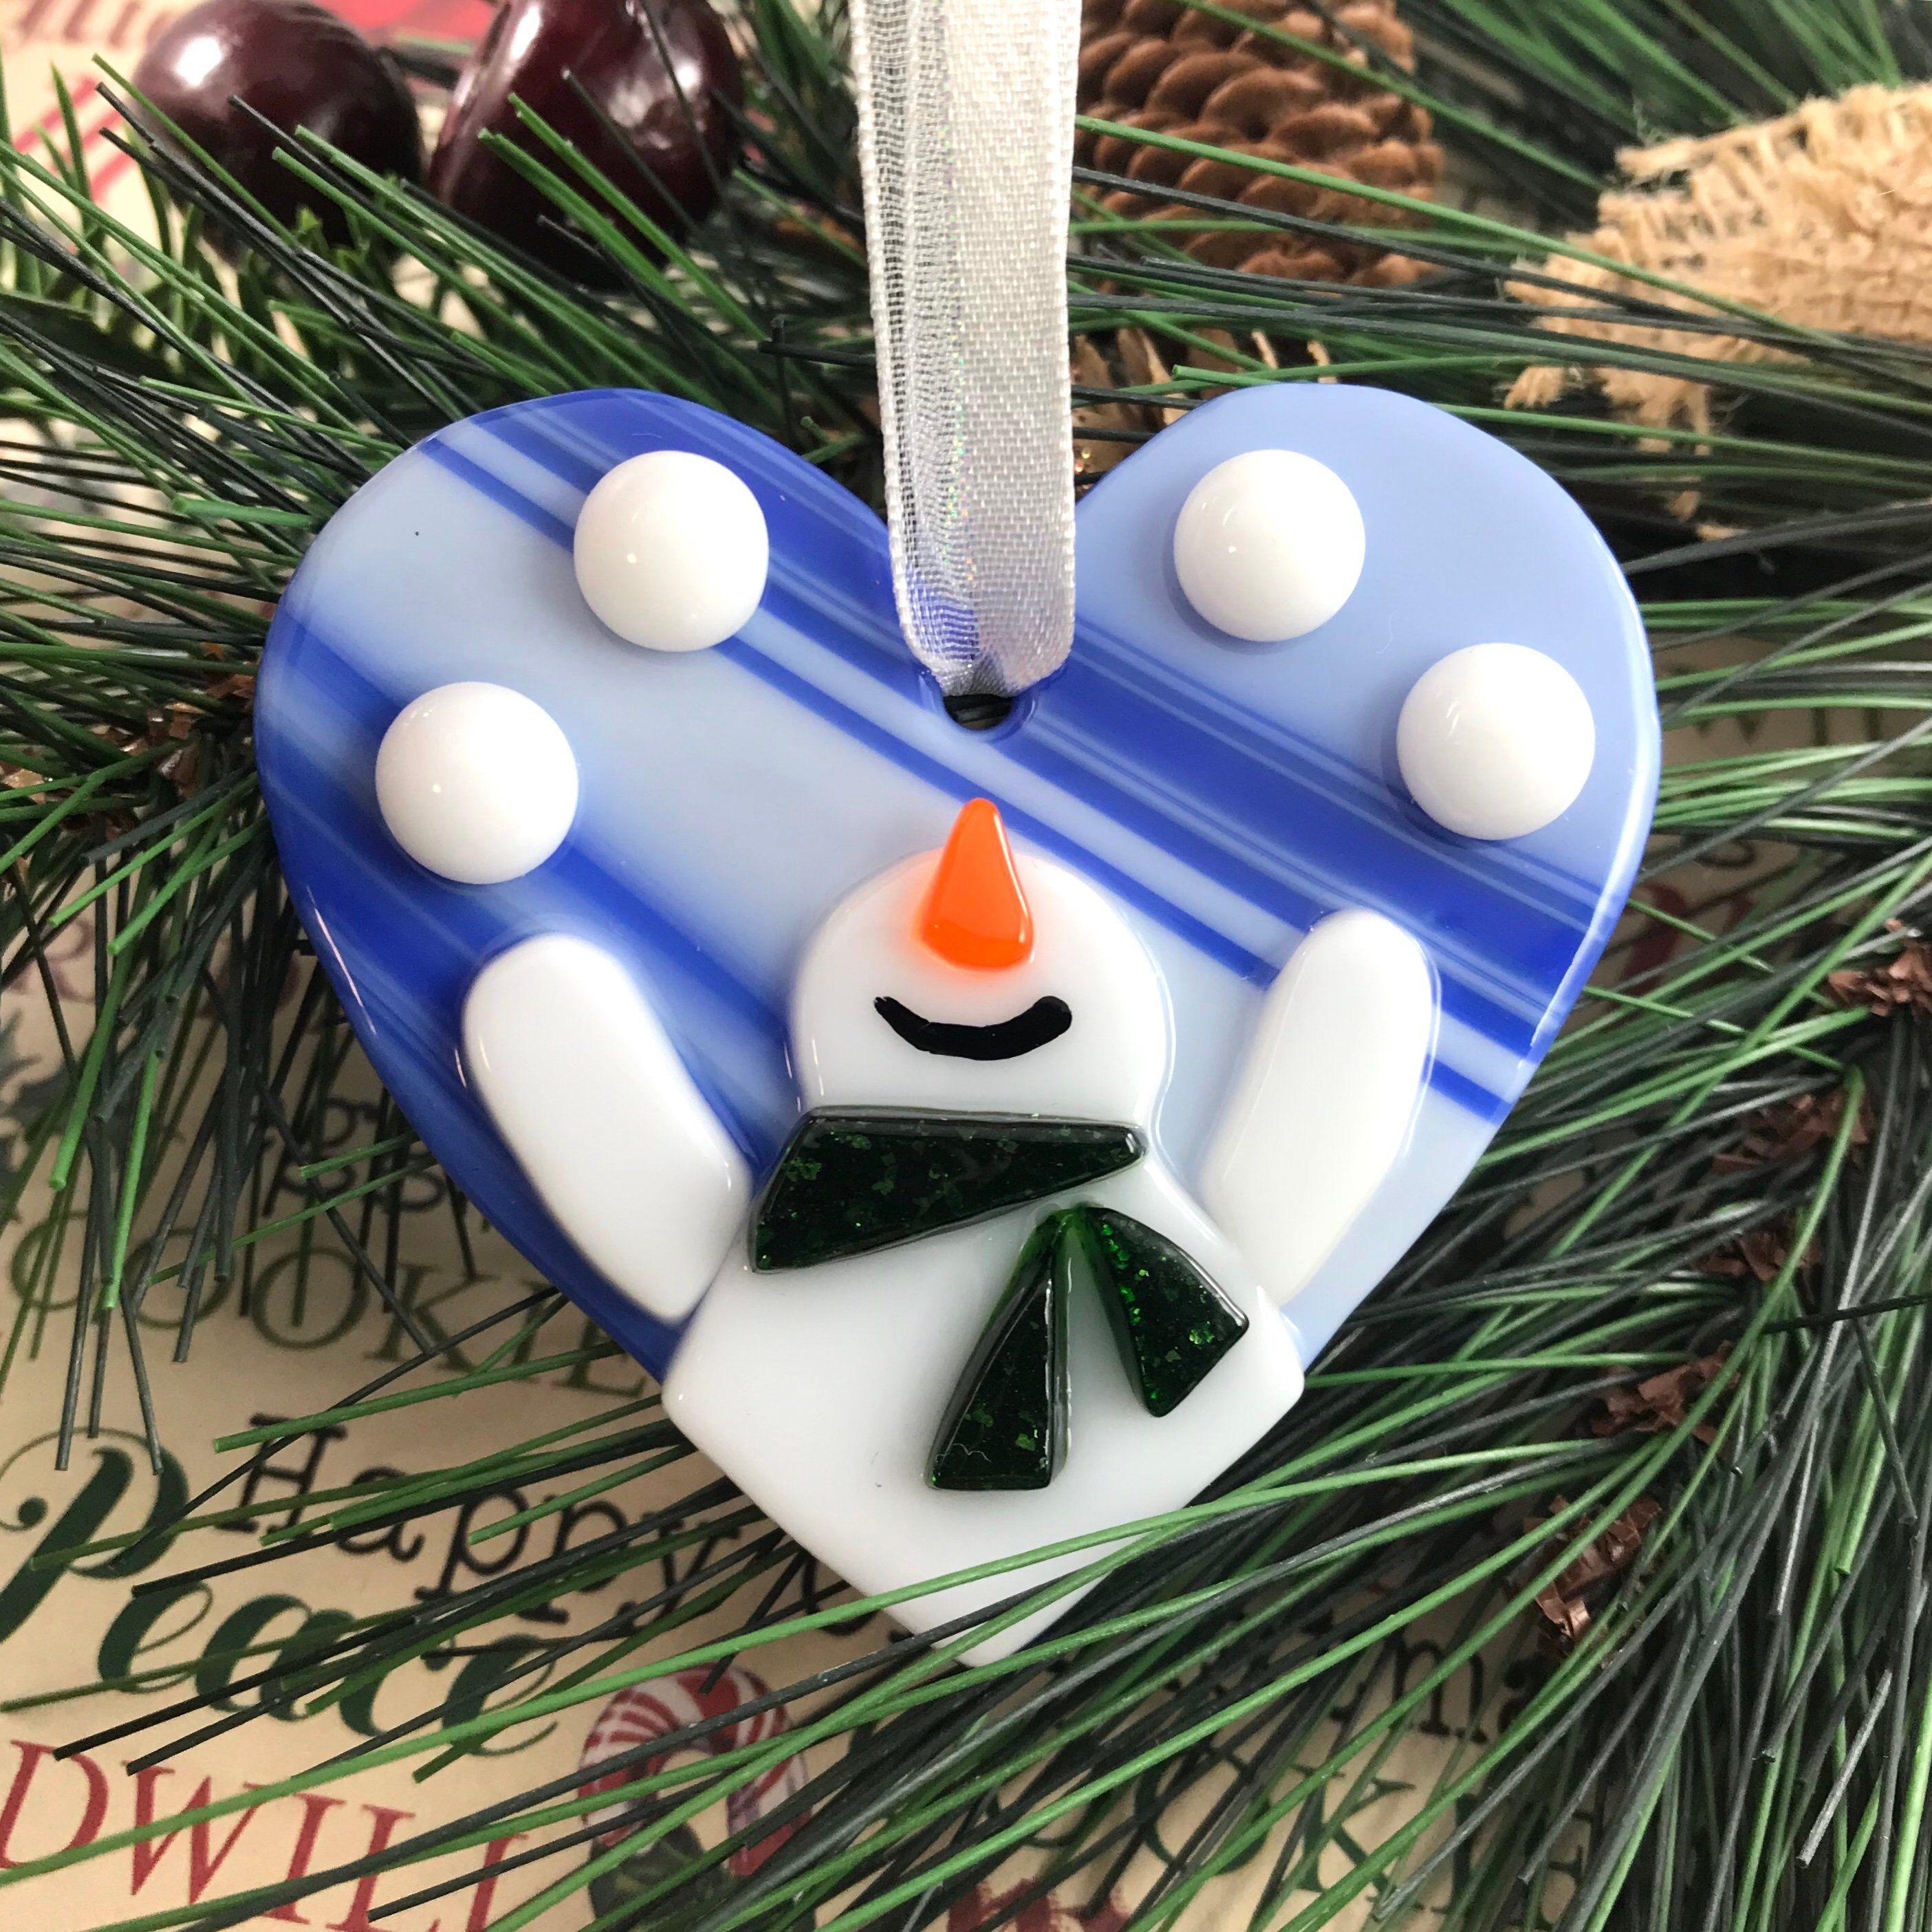 Juggling Snowman Ornament Fused Glass Snowman Glass Heart Ornament Christmas Ornament Happy Snowman Holiday Decor Tree Decoration Glass Christmas Decorations Glass Christmas Ornaments Fused Glass Ornaments